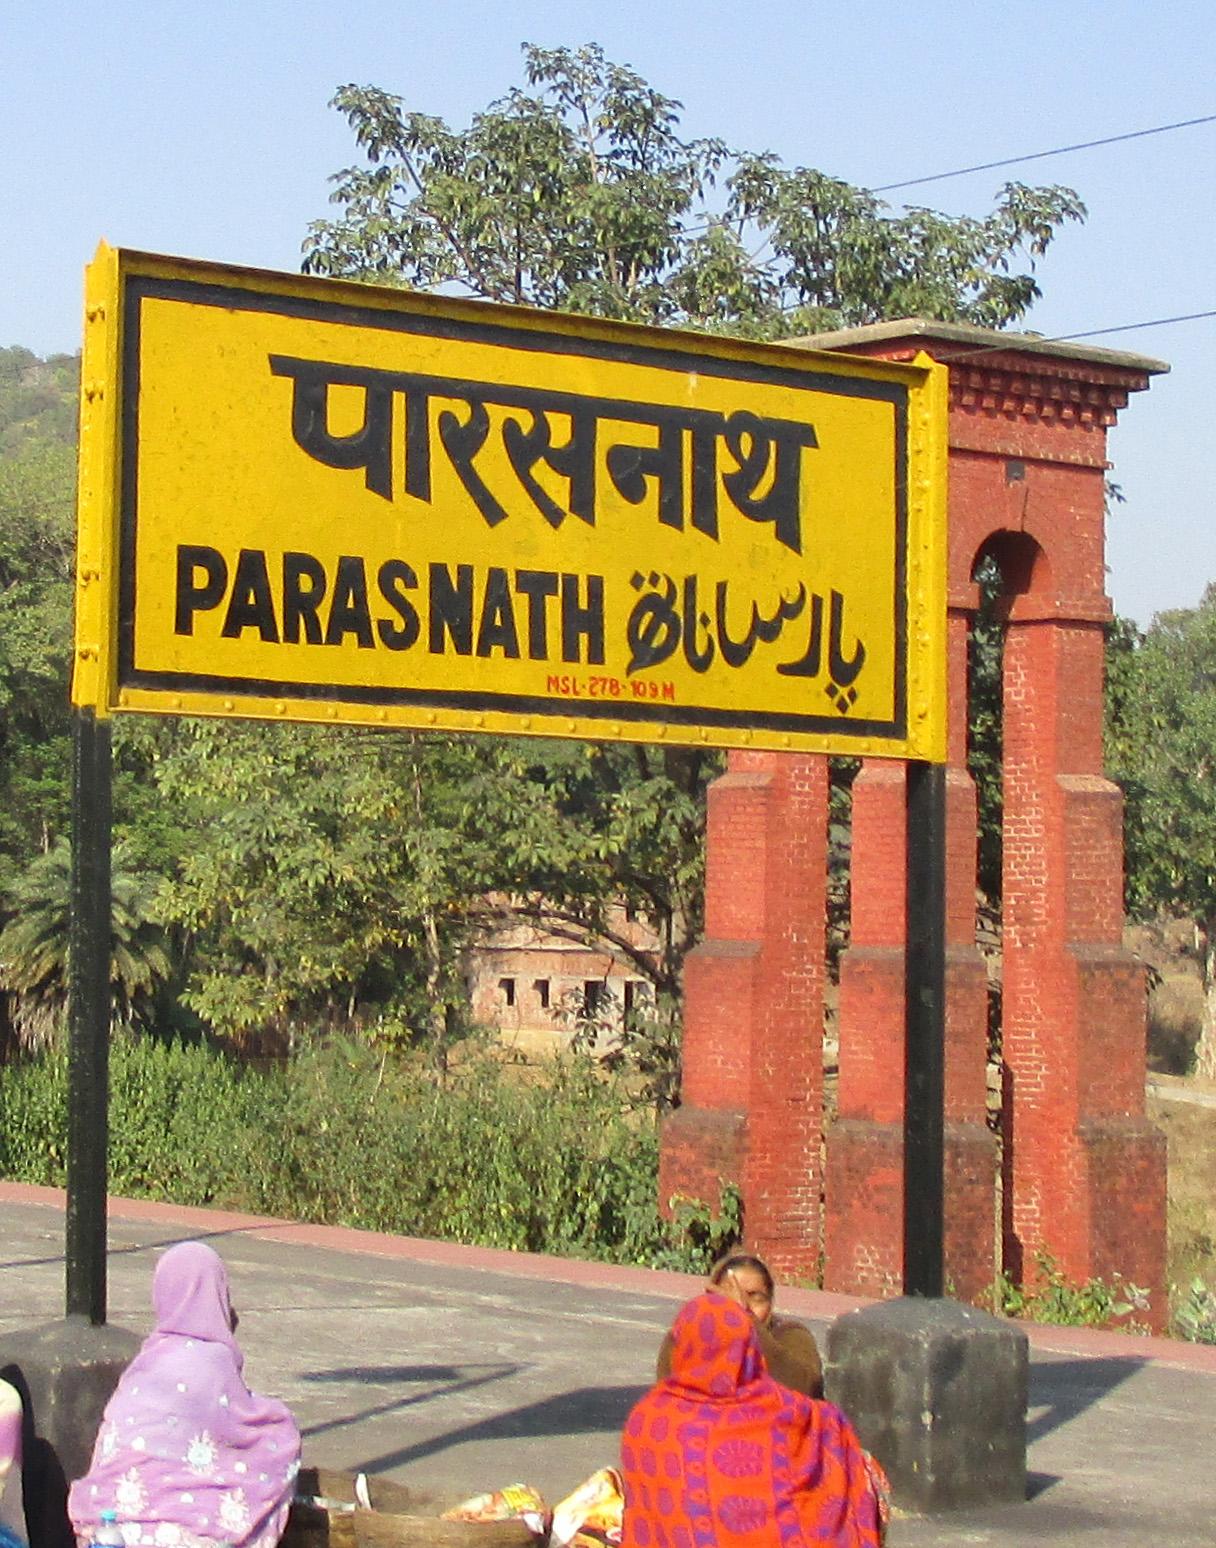 Parasnath railway station - Wikipedia